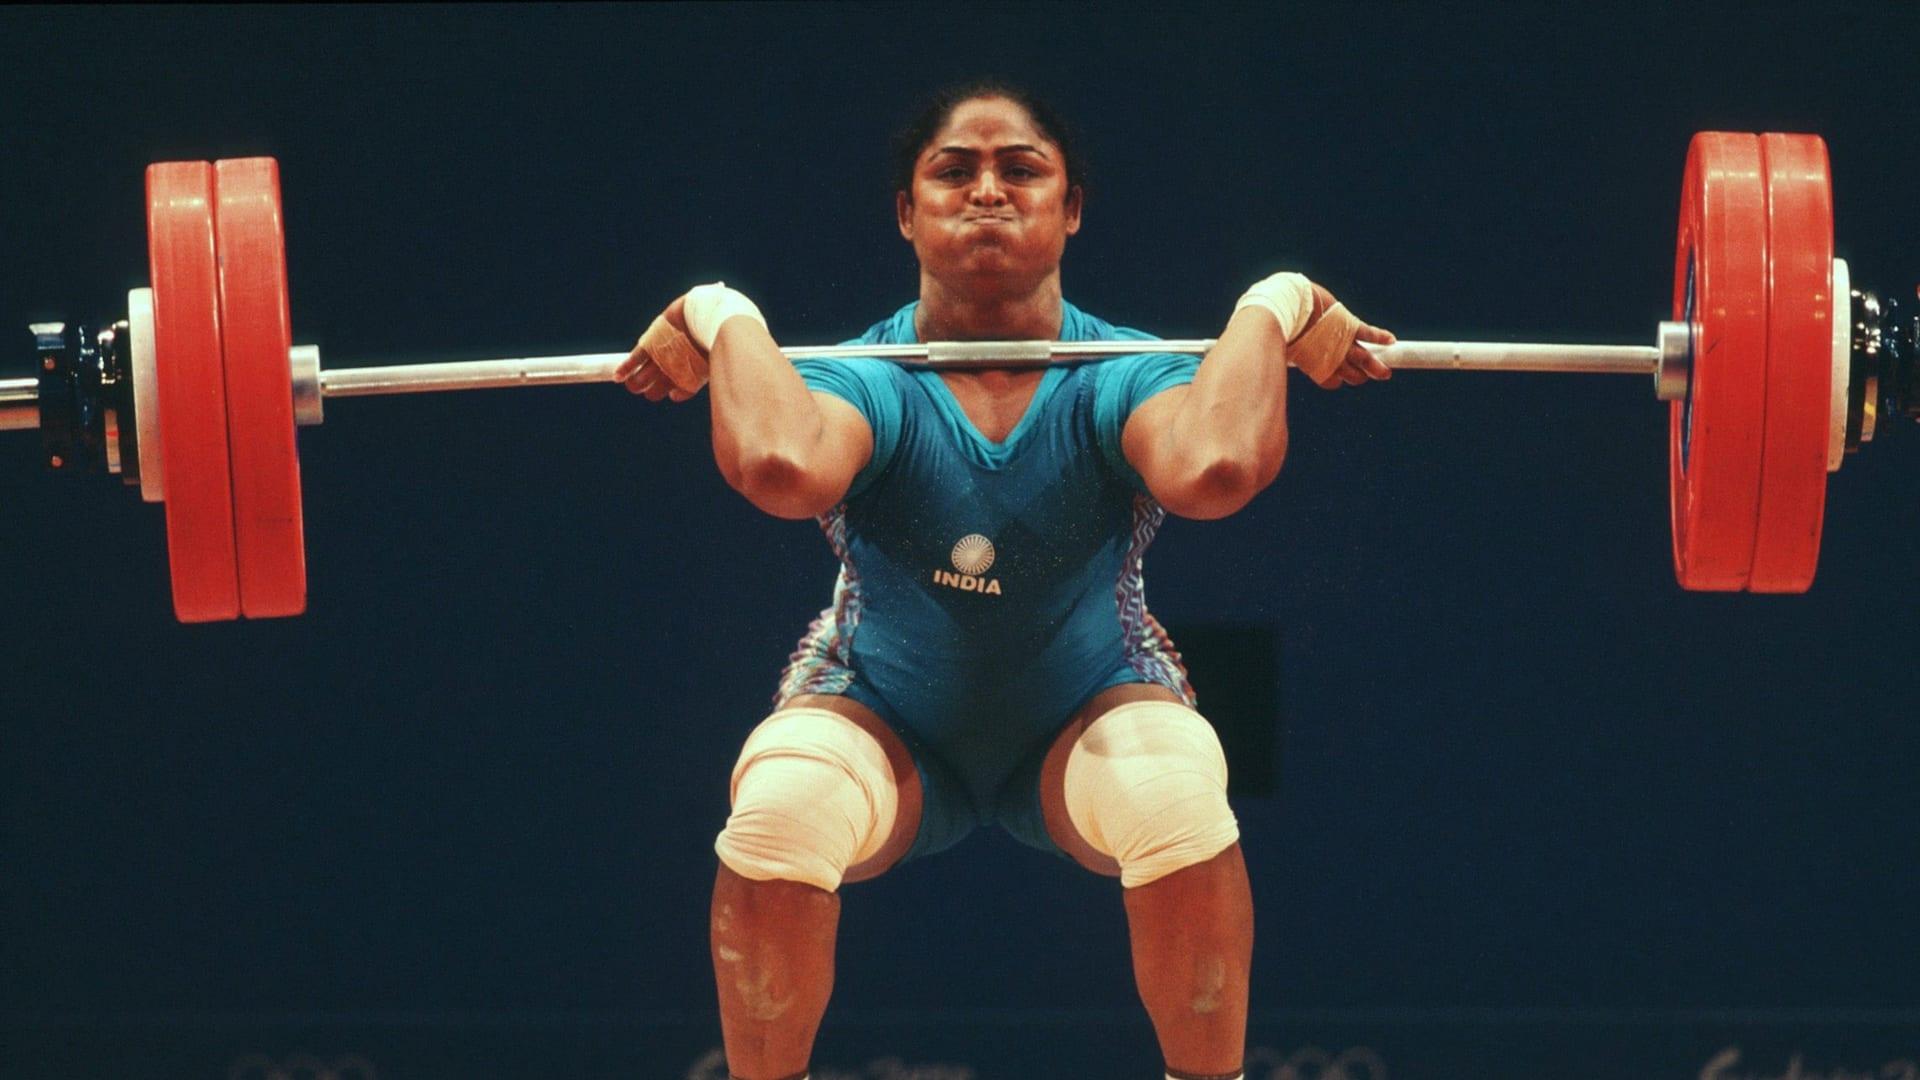 Indian Weightlifter Karnam Malleswari KreedOn